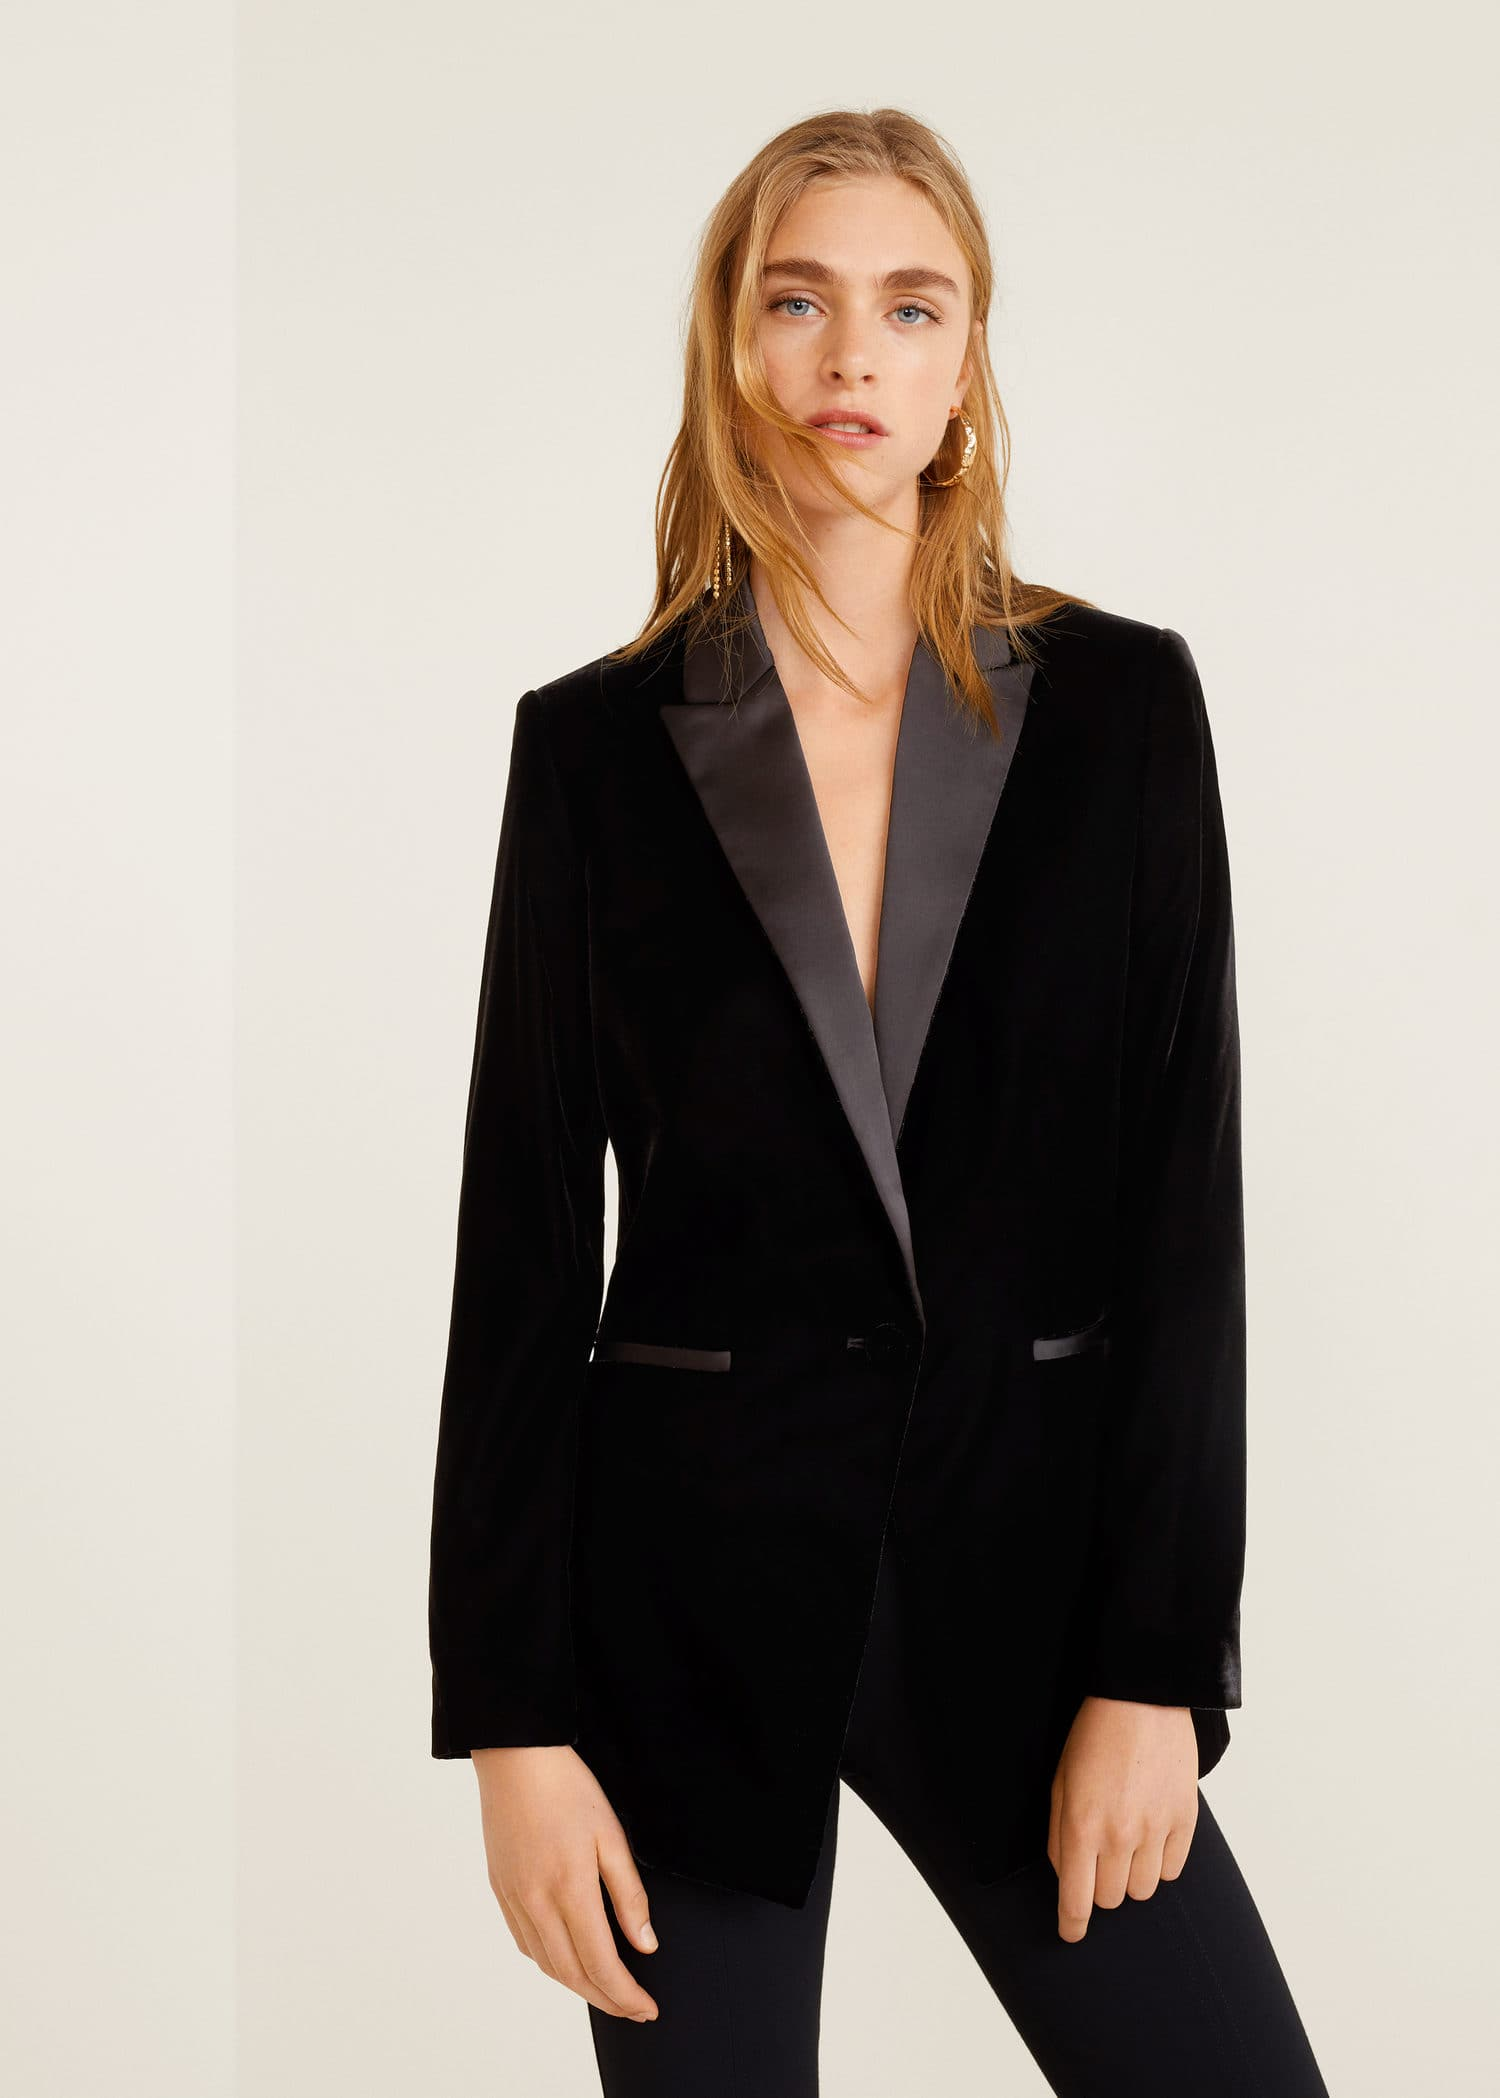 Coats, Jackets & Vests Zara Black Tuxedo Style Double Breasted Velvet Blazer Jacket AW18 Medium ...